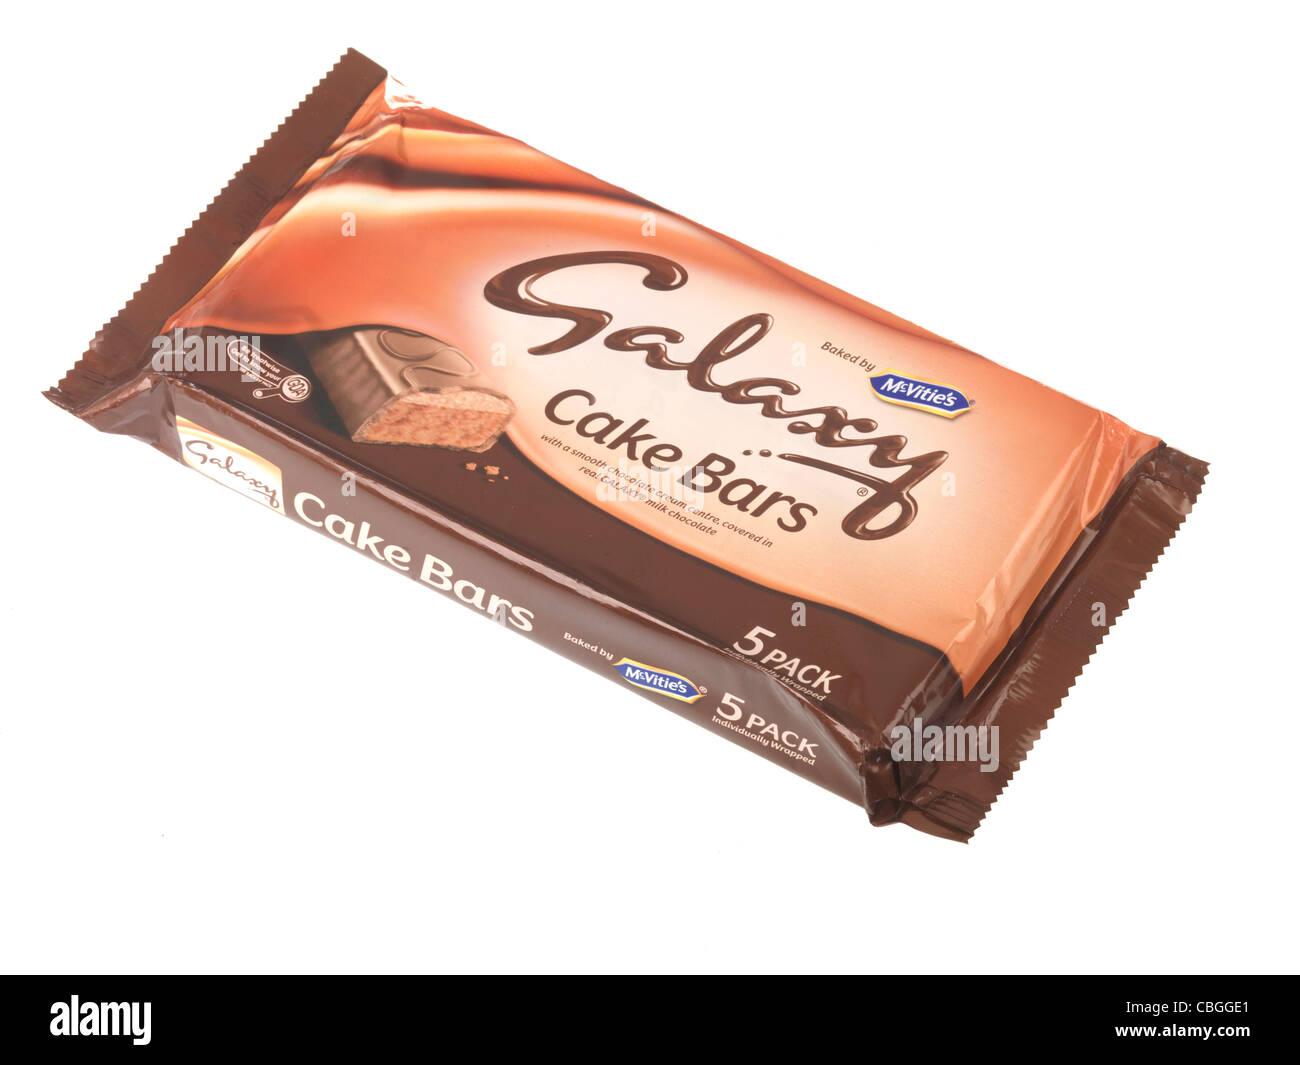 Galaxy Chocolate Bar Stock Photos & Galaxy Chocolate Bar Stock ...